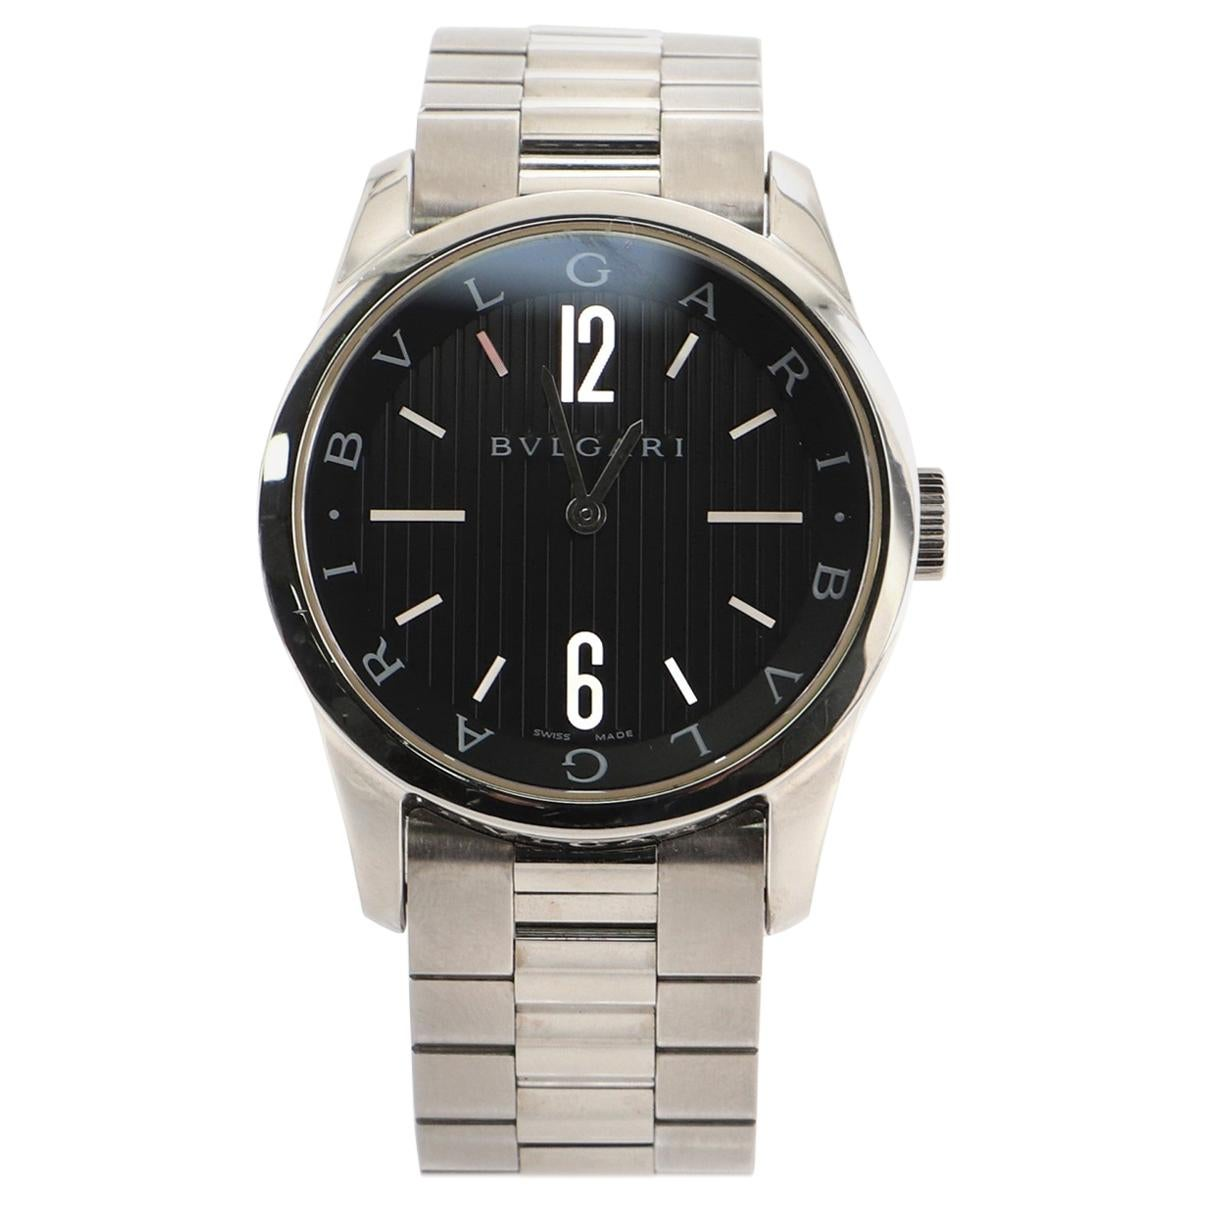 Bvlgari Solotempo Quartz Watch Stainless Steel 37